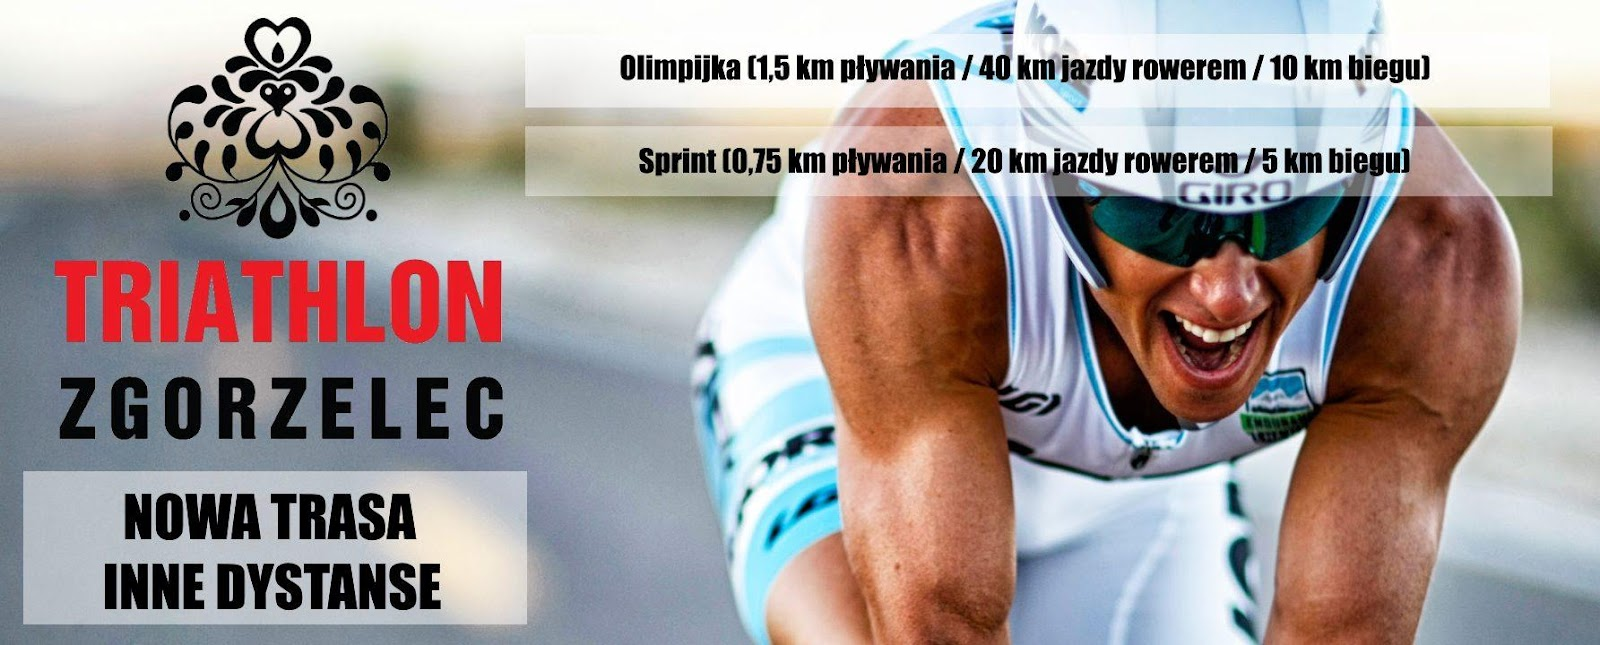 http://triathlonzgorzelec.pl/wp-content/uploads/2017/02/dystanse2-e1485947896963.jpg